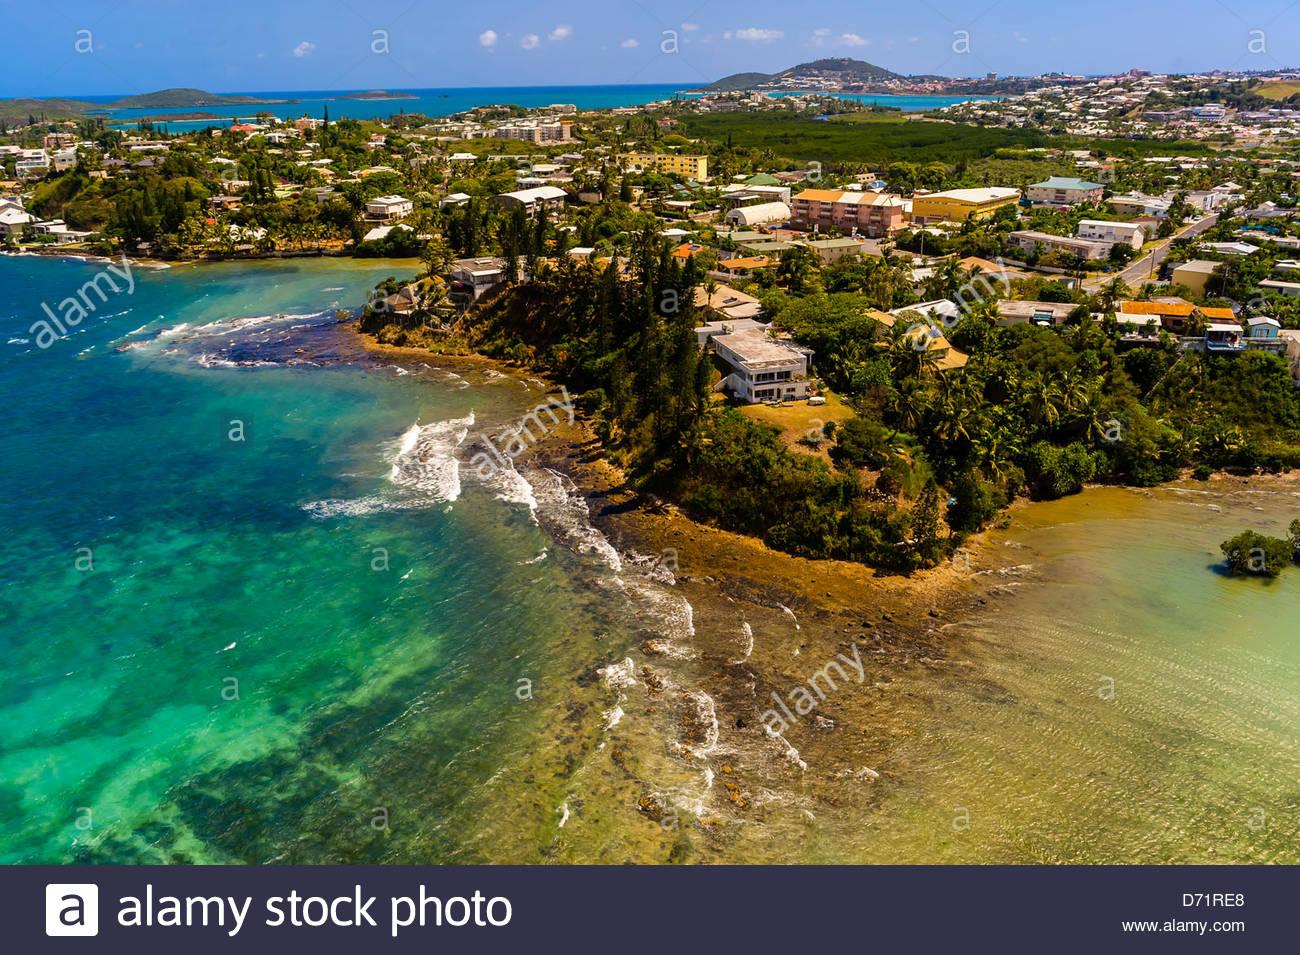 Aerial View, Coastline, Noumea, Grand Terre, New Caledonia - Stock Image